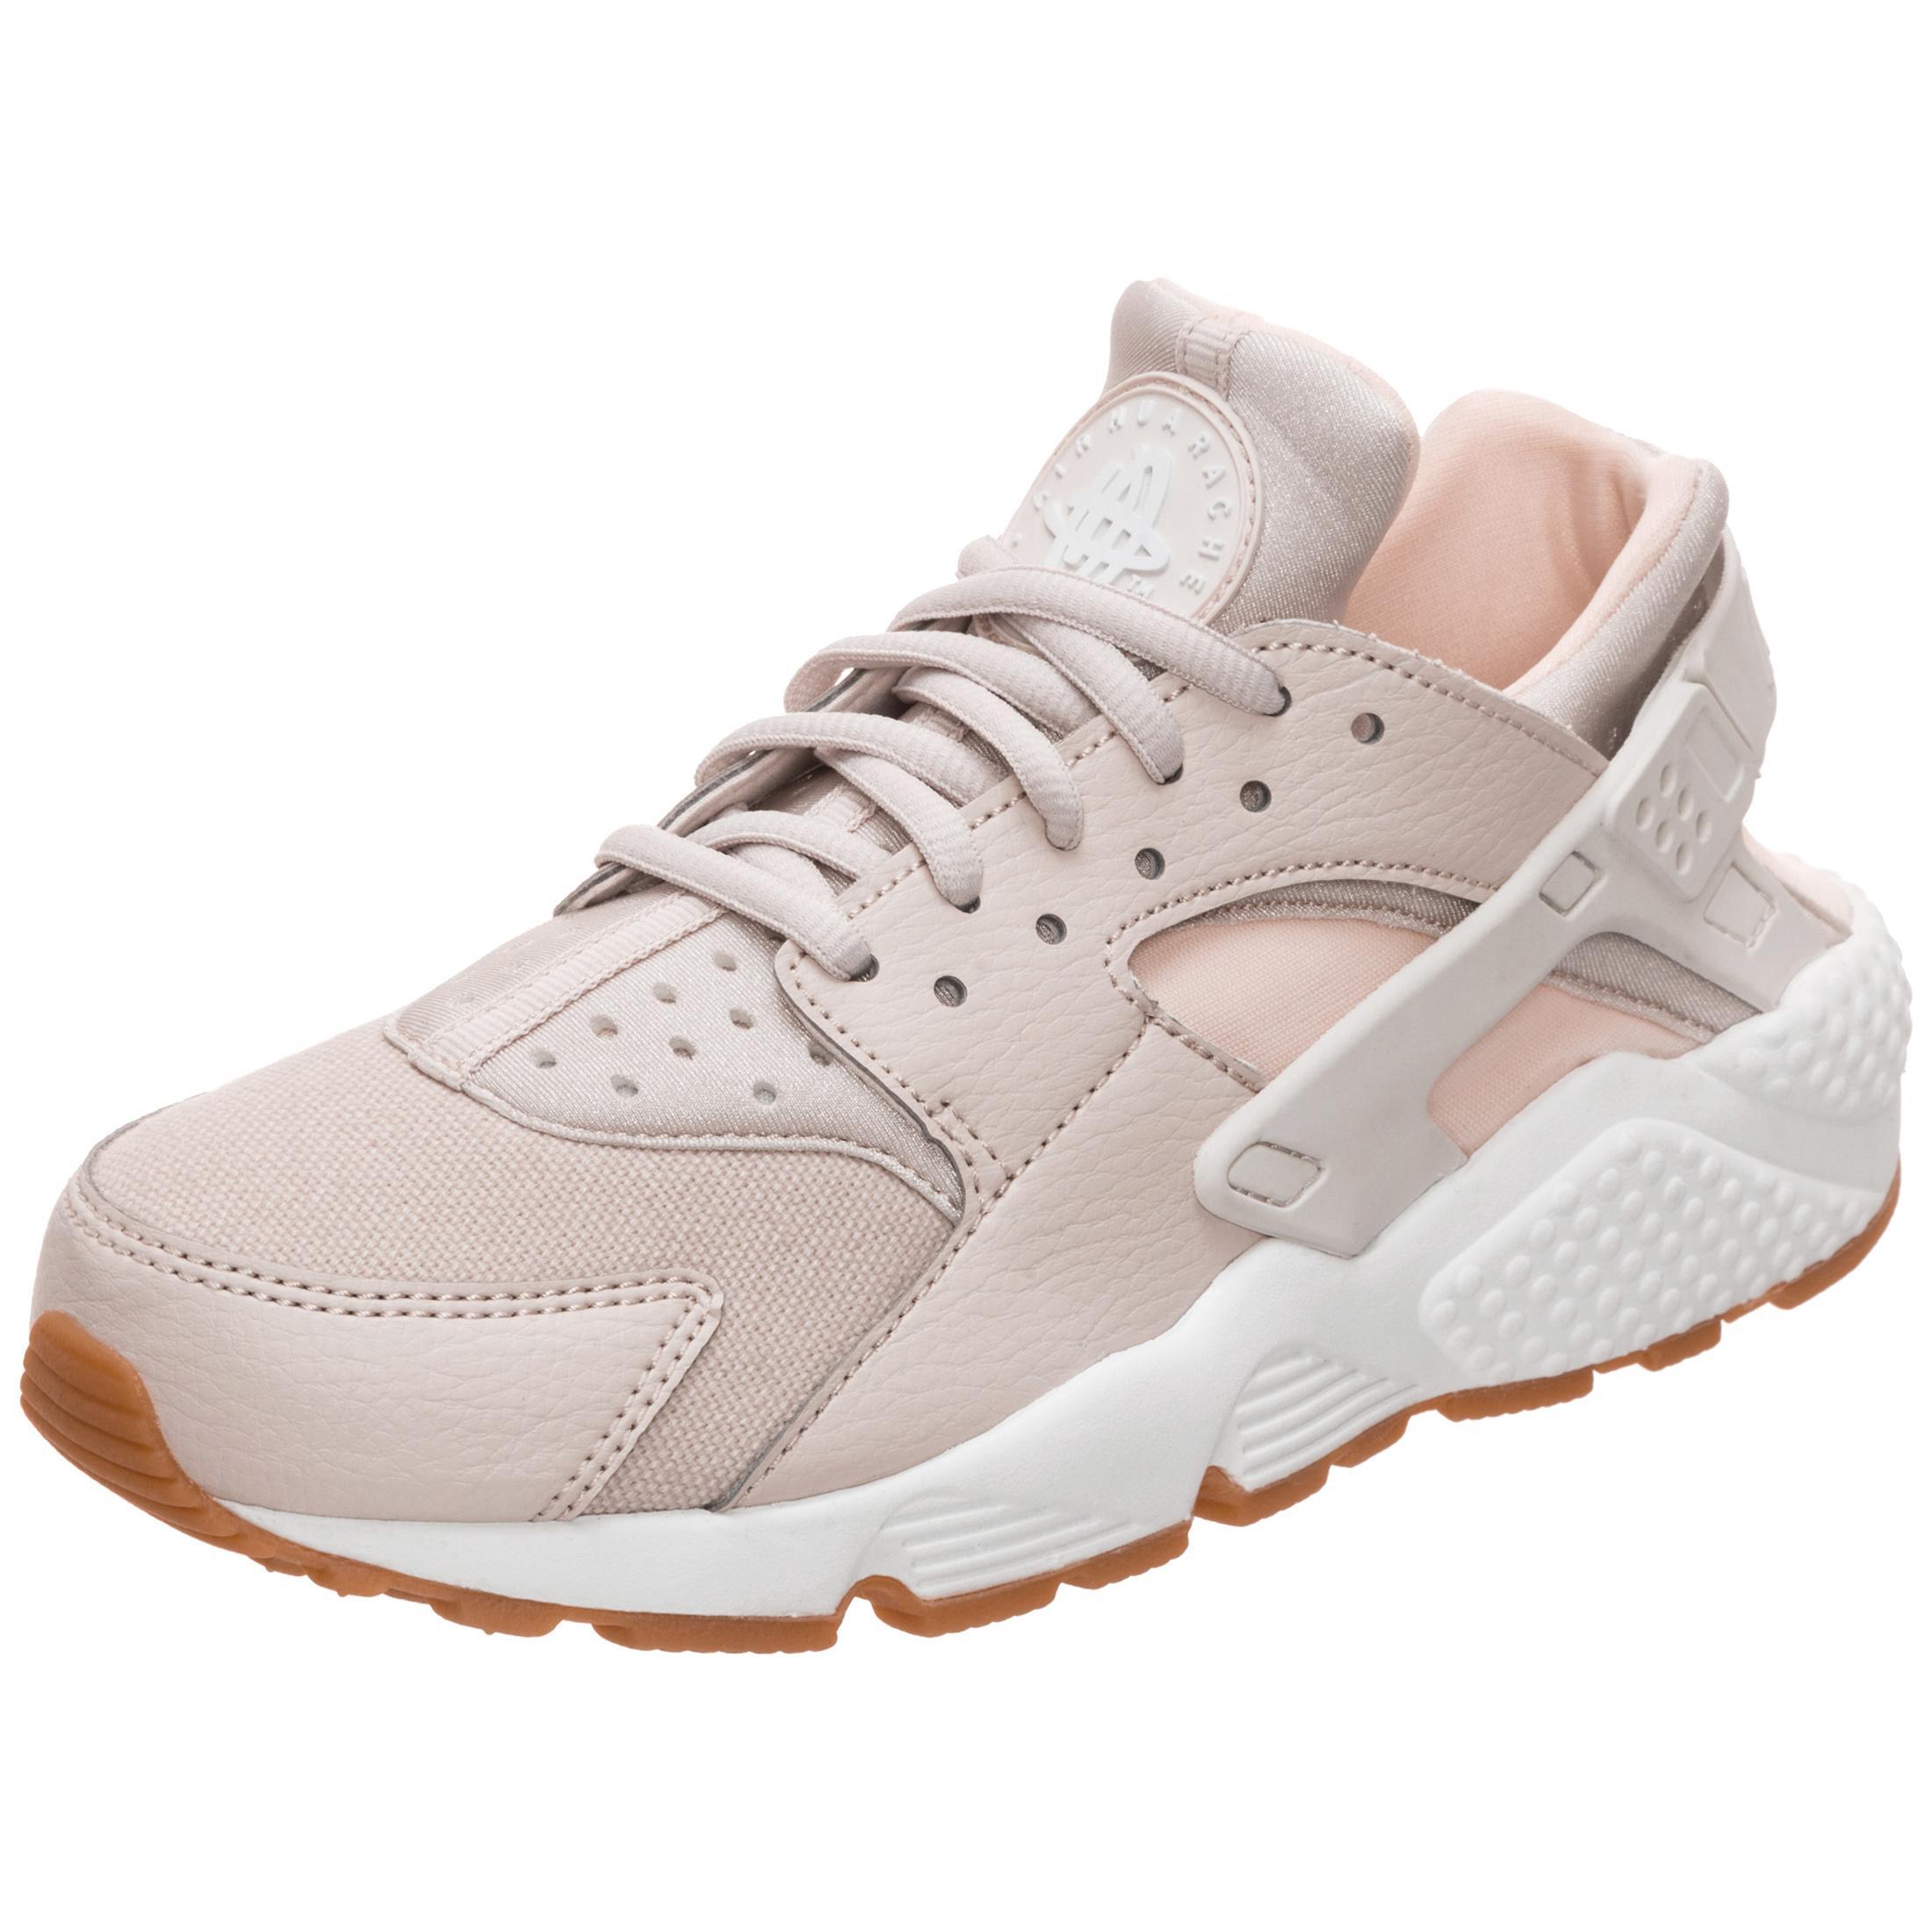 Nike Air Huarache Run Sneaker Damen beige / weiß / rosa im Online ...